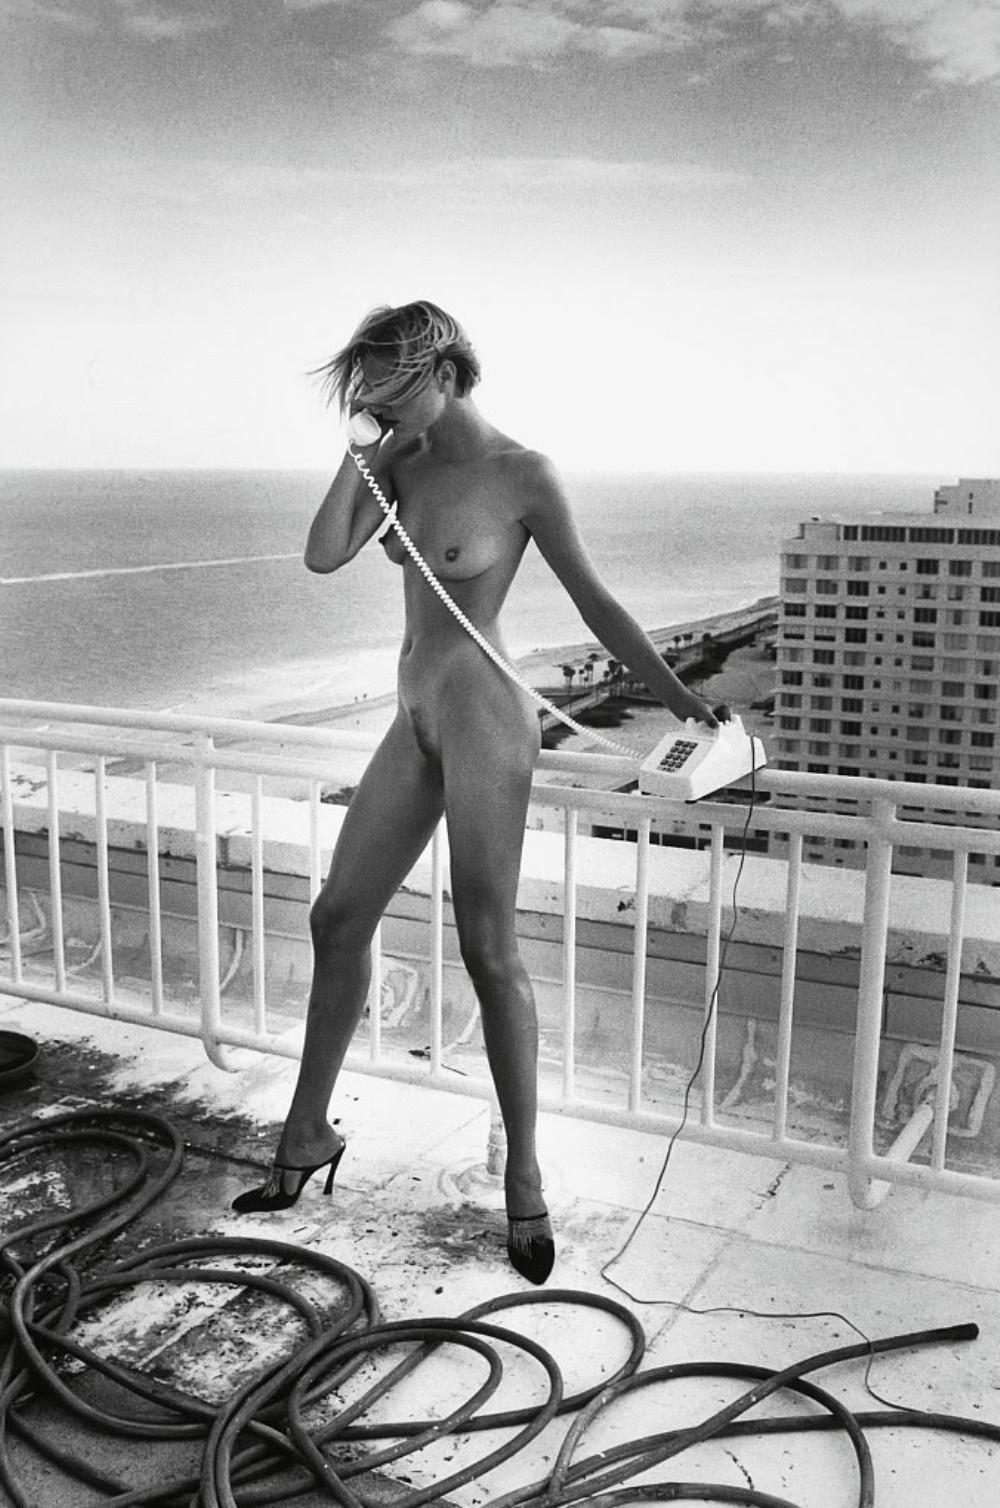 Celia weston nude